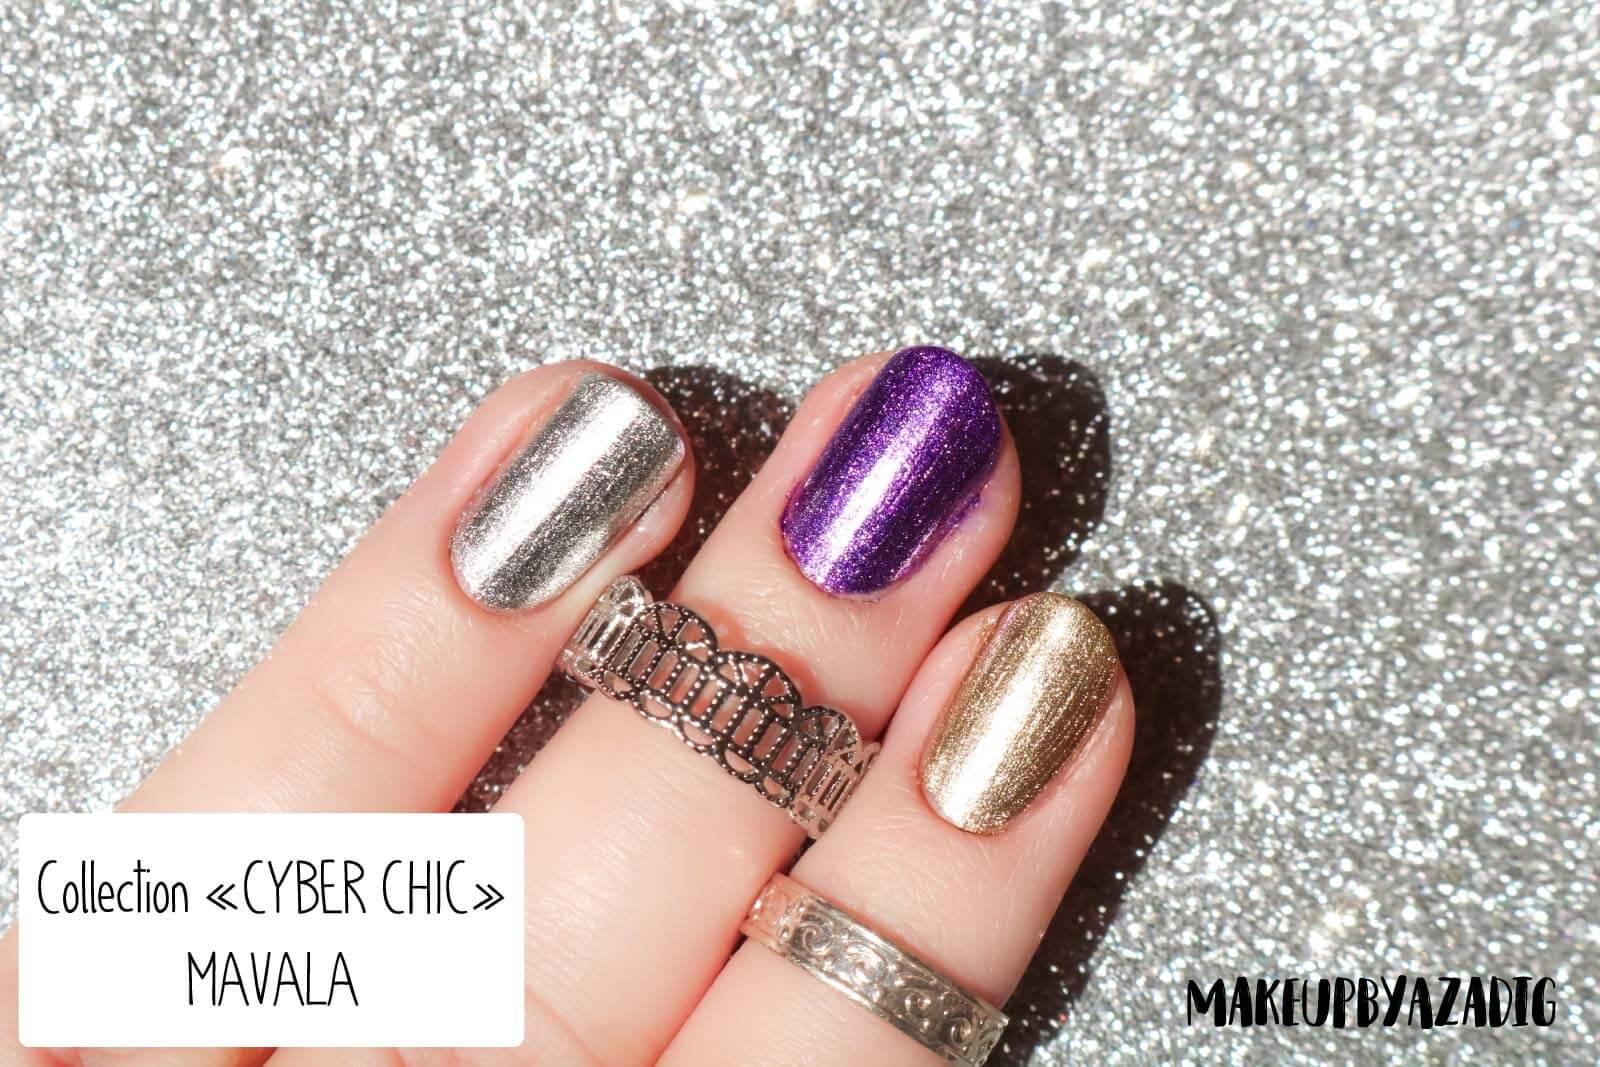 revue-collection-vernis-cyber-chic-fetes-noel-metallique-gold-silver-makeupbyazadig-swatch-avis-prix-swatches